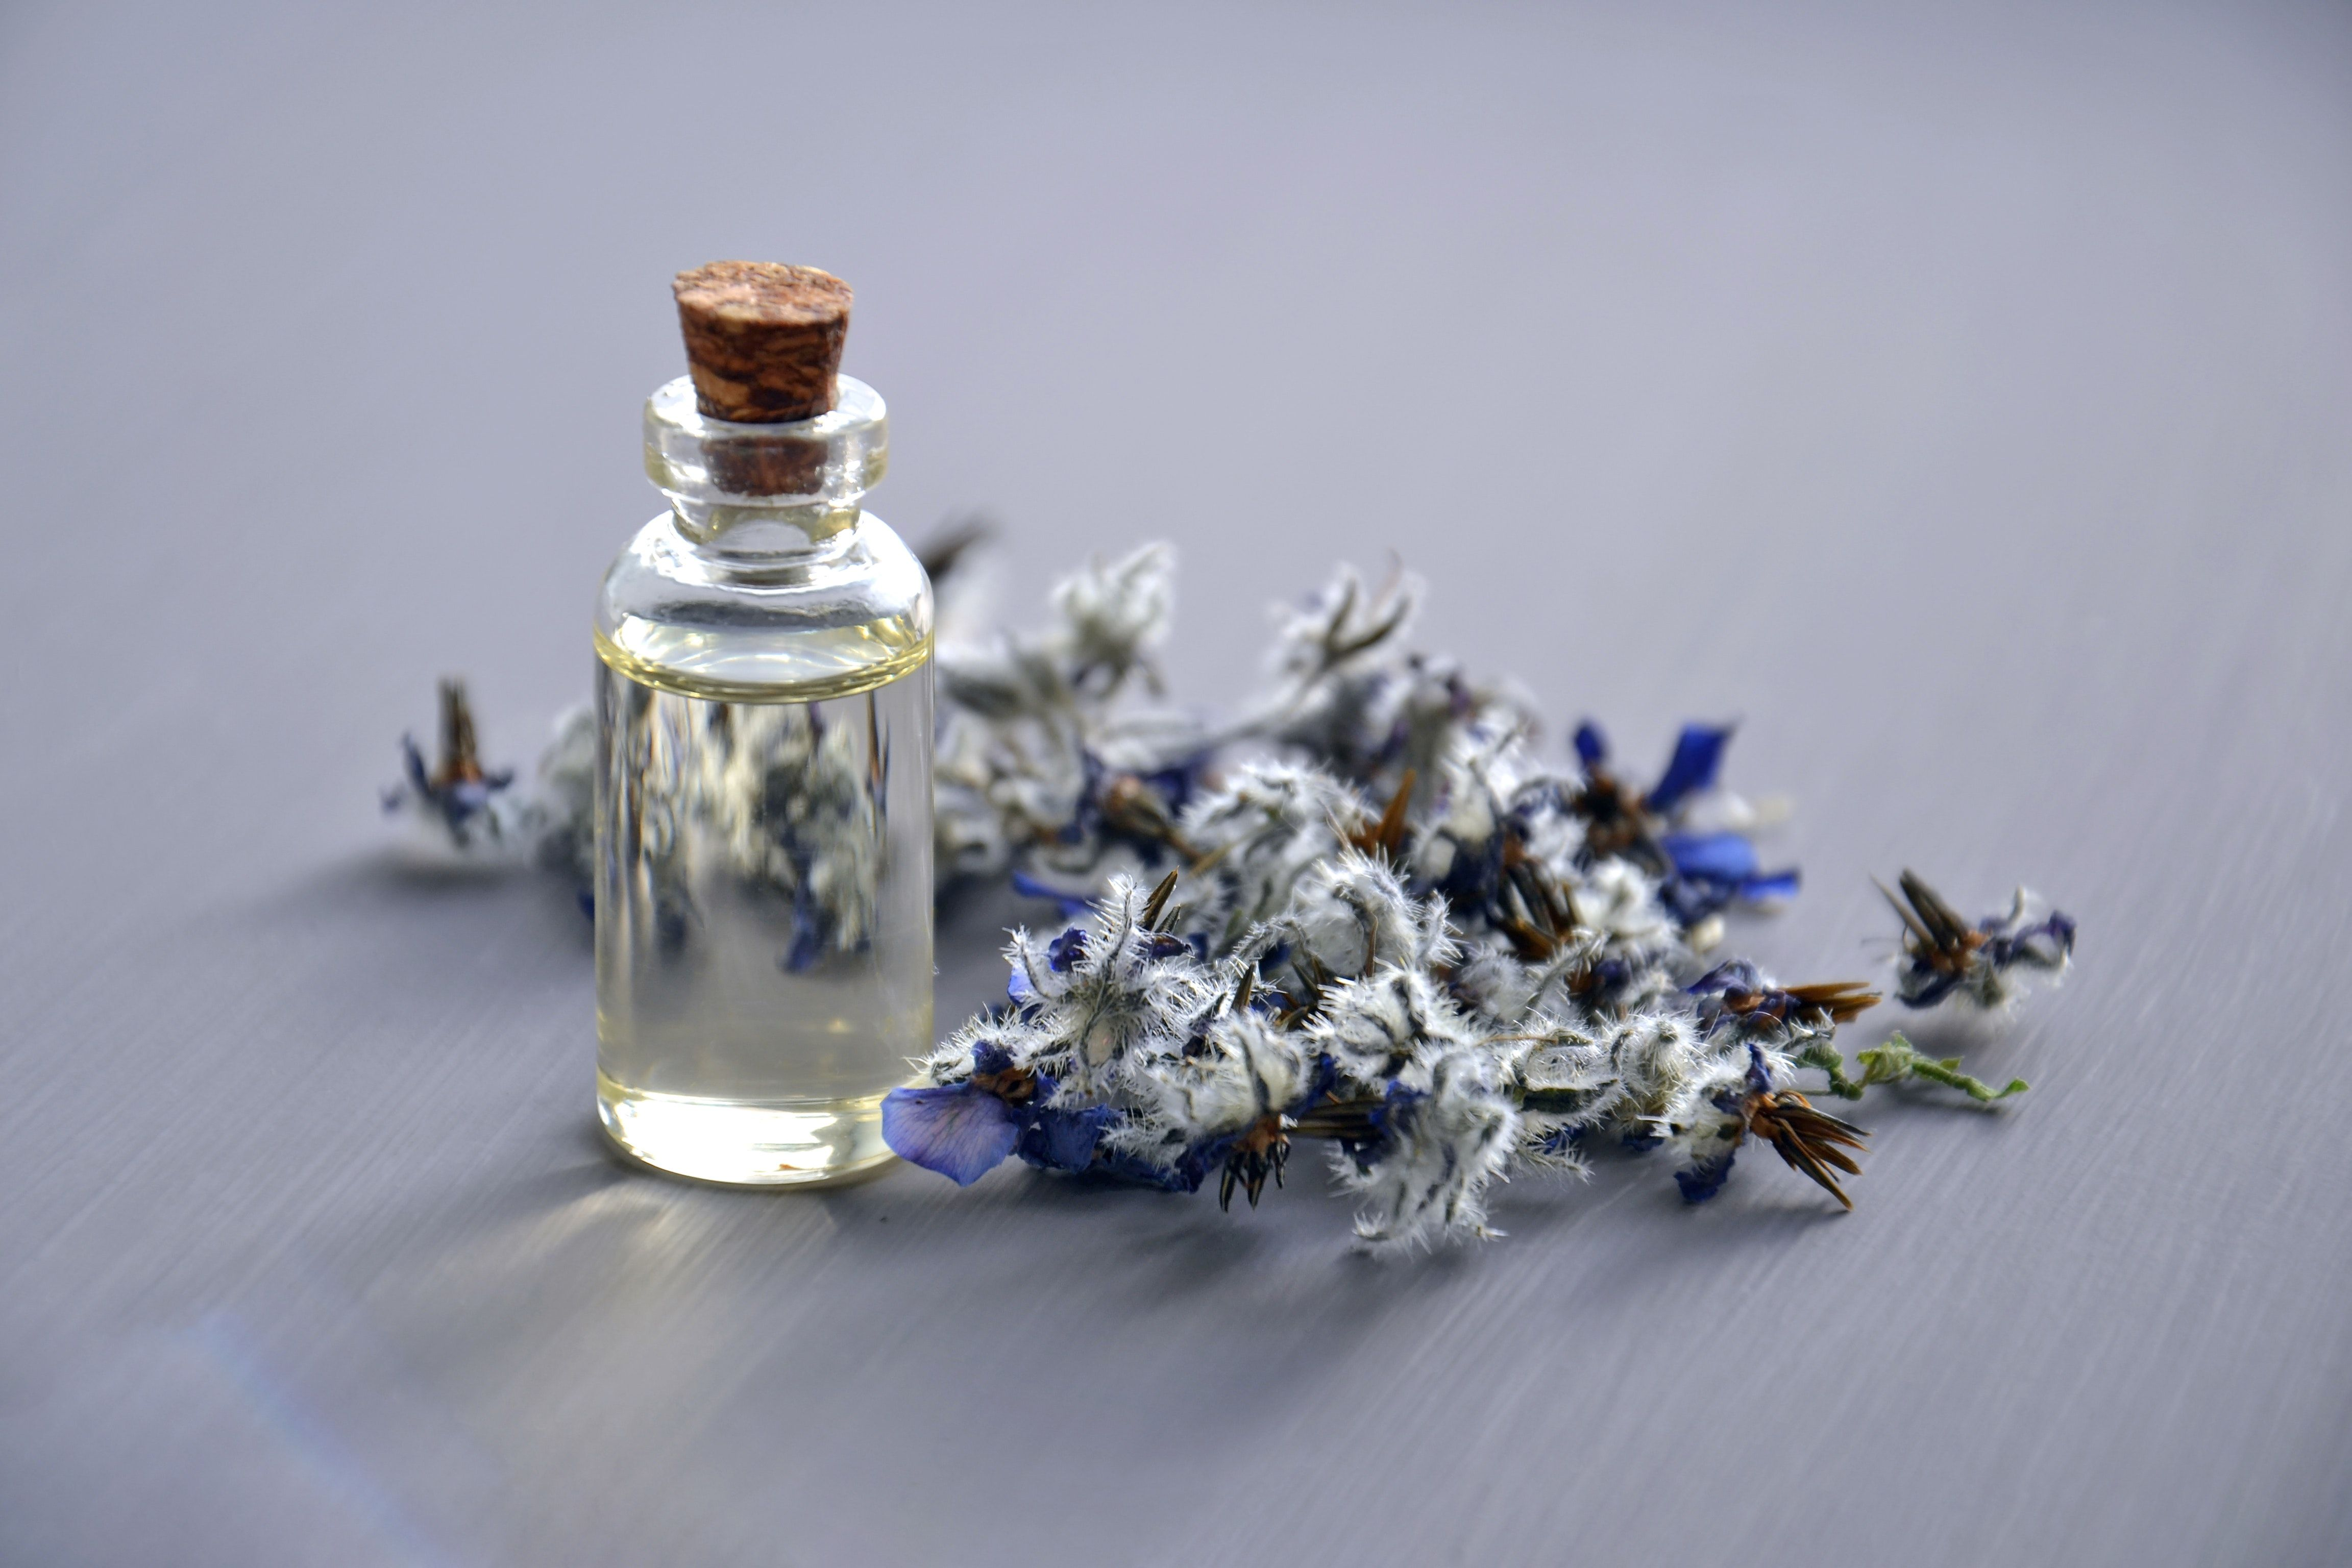 Fine & oriental perfumery